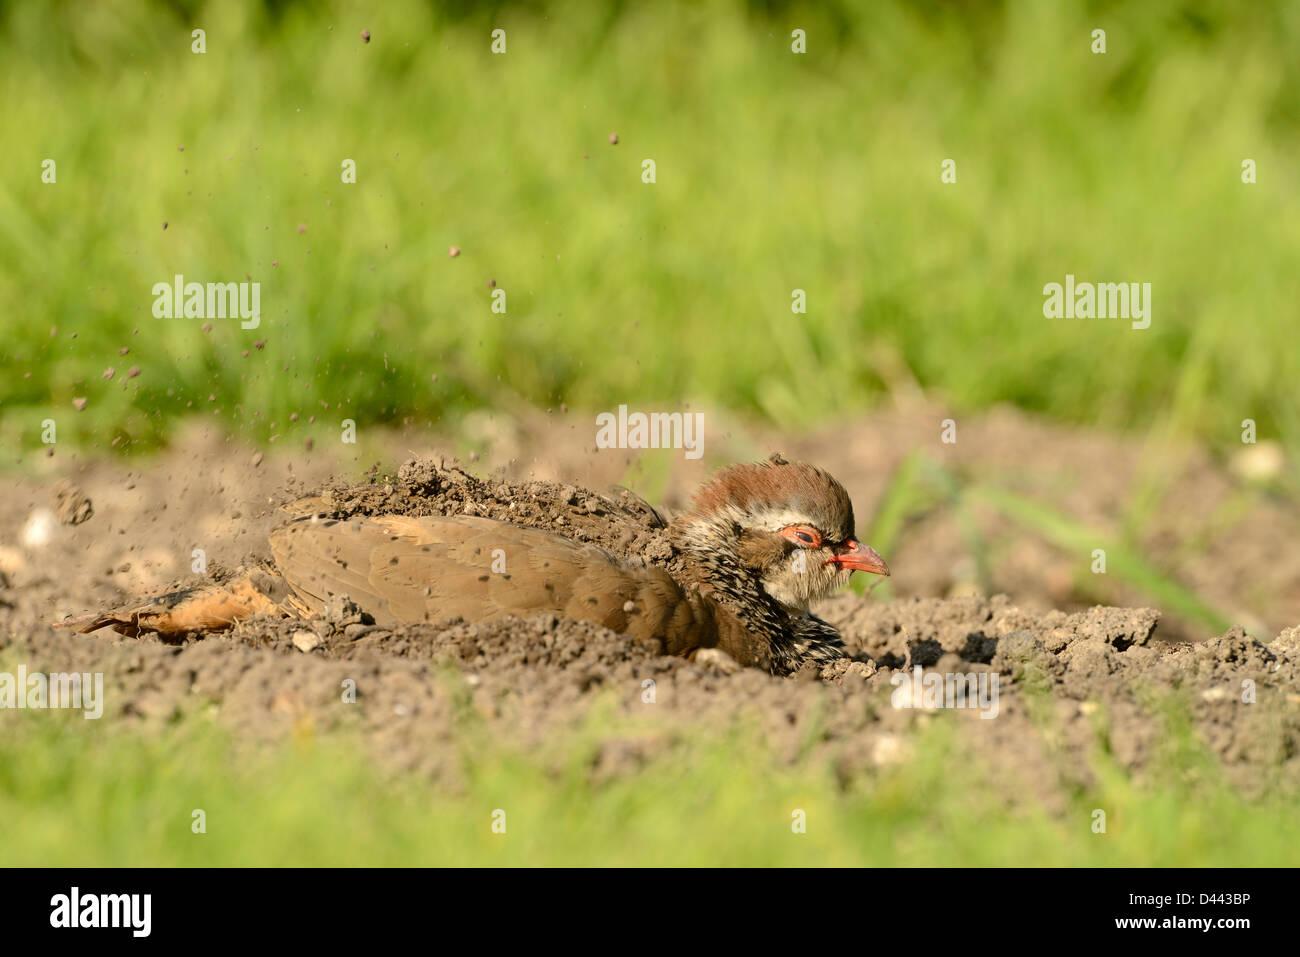 Red-legged Partridge (Alectoris rufa) sat on ground, dust bathing, Oxfordshire, England, September - Stock Image